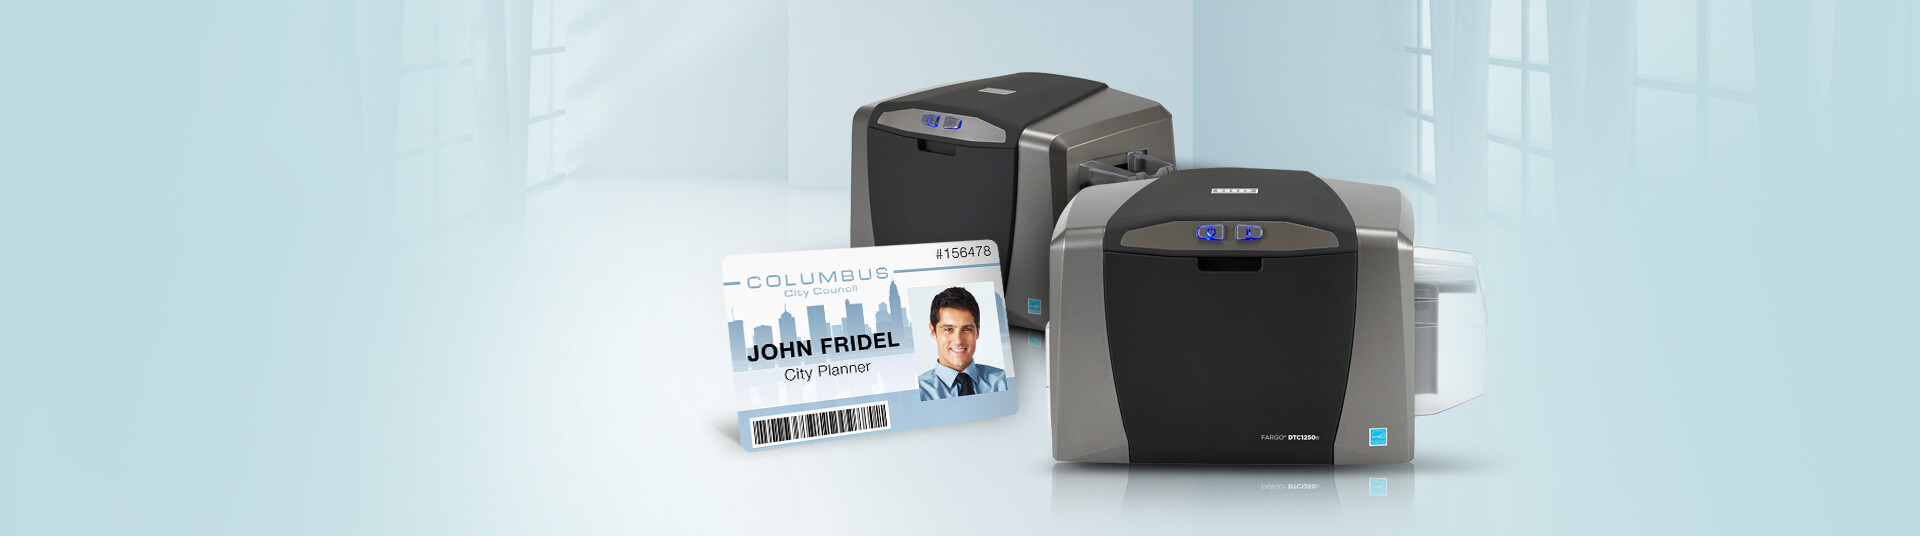 Fargo DTC1250e ID Card Printers